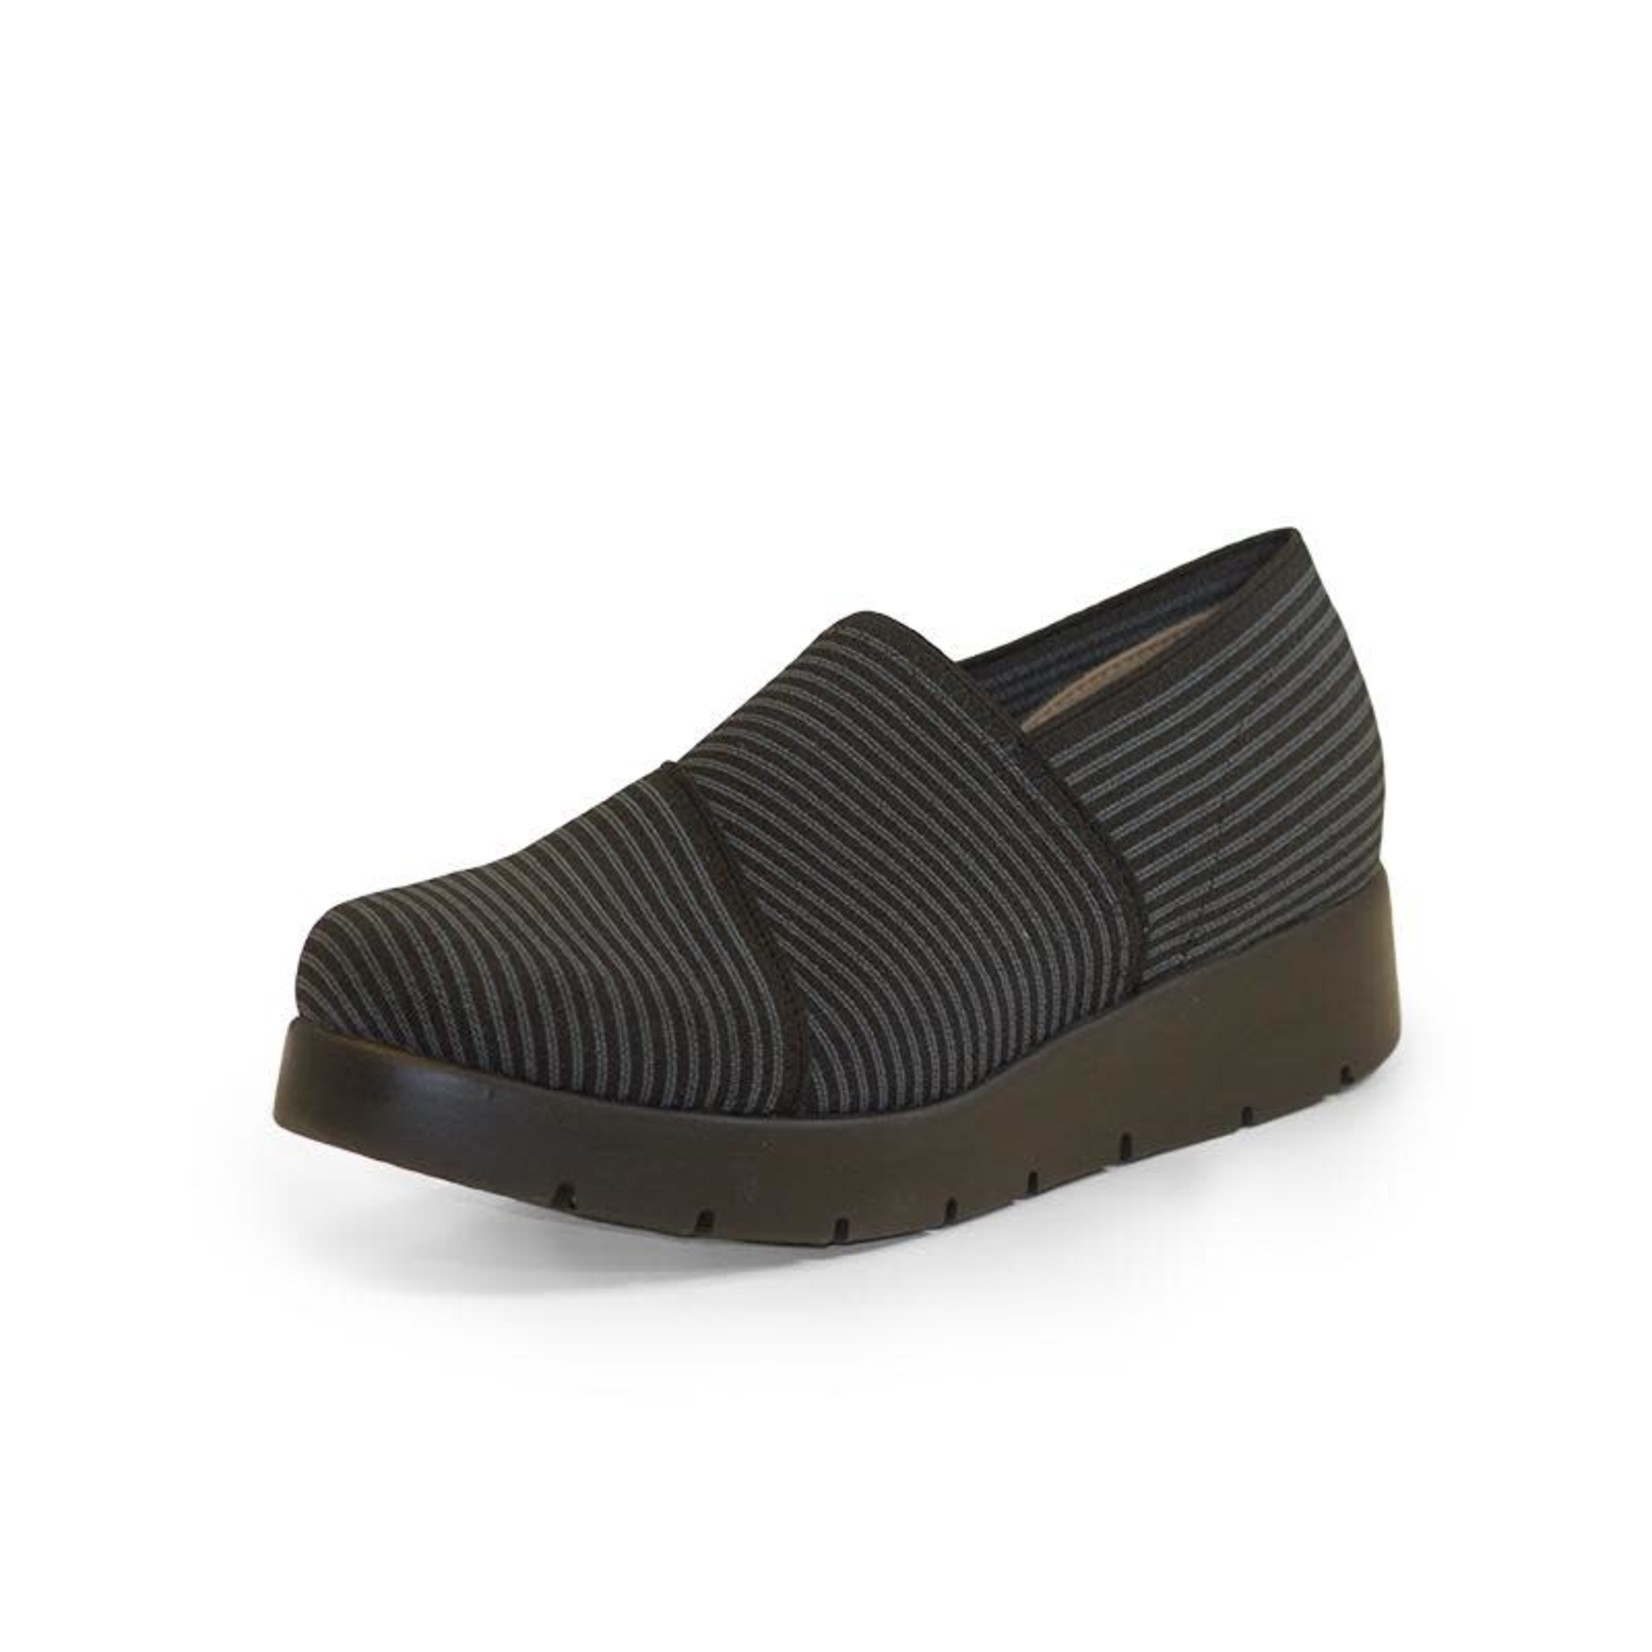 Milly Shoe in Gray Pin Stripe 8